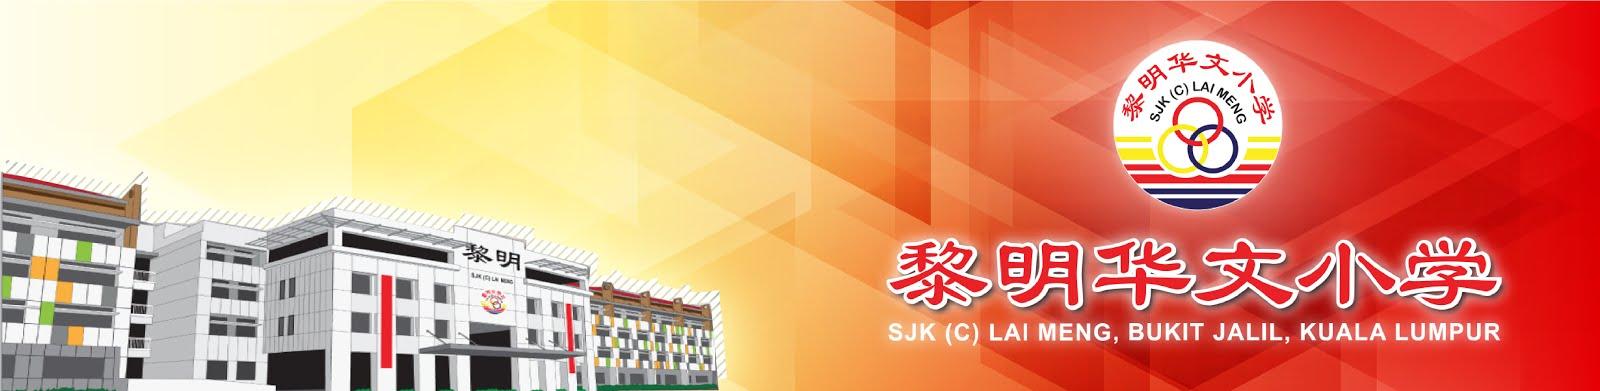 SJK ( C ) LAI MENG